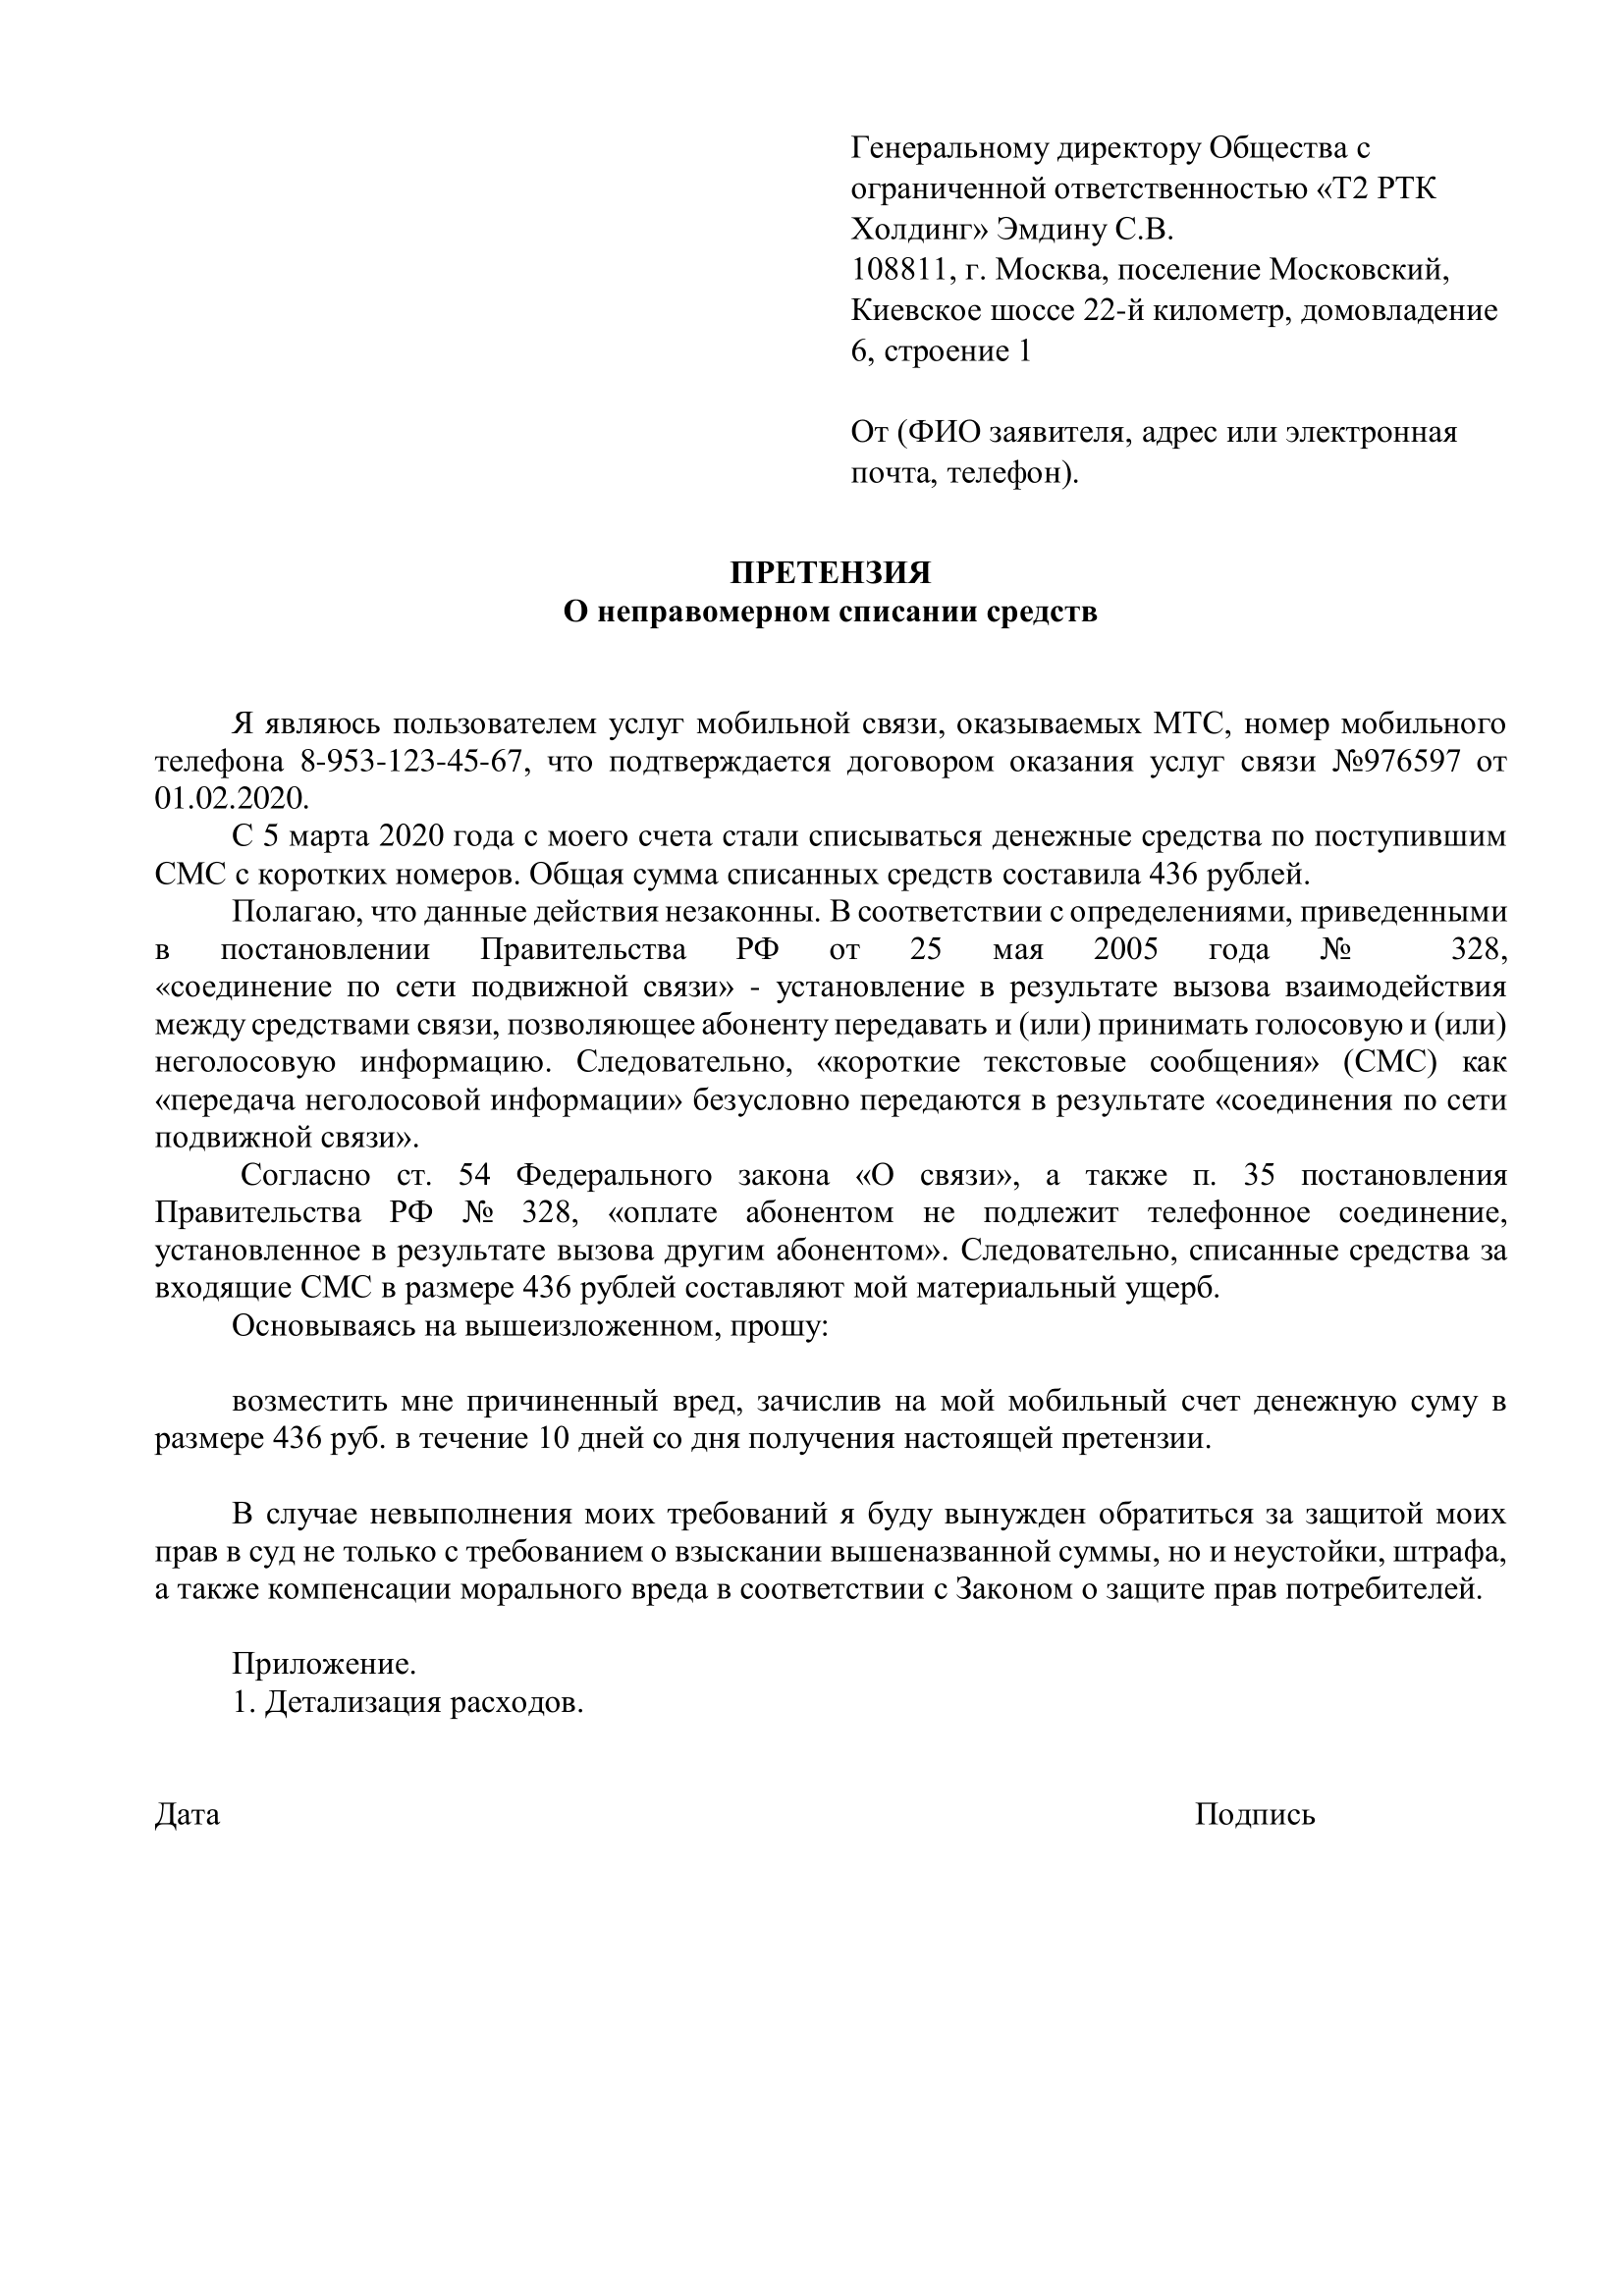 Образец претензии к оператору Теле2